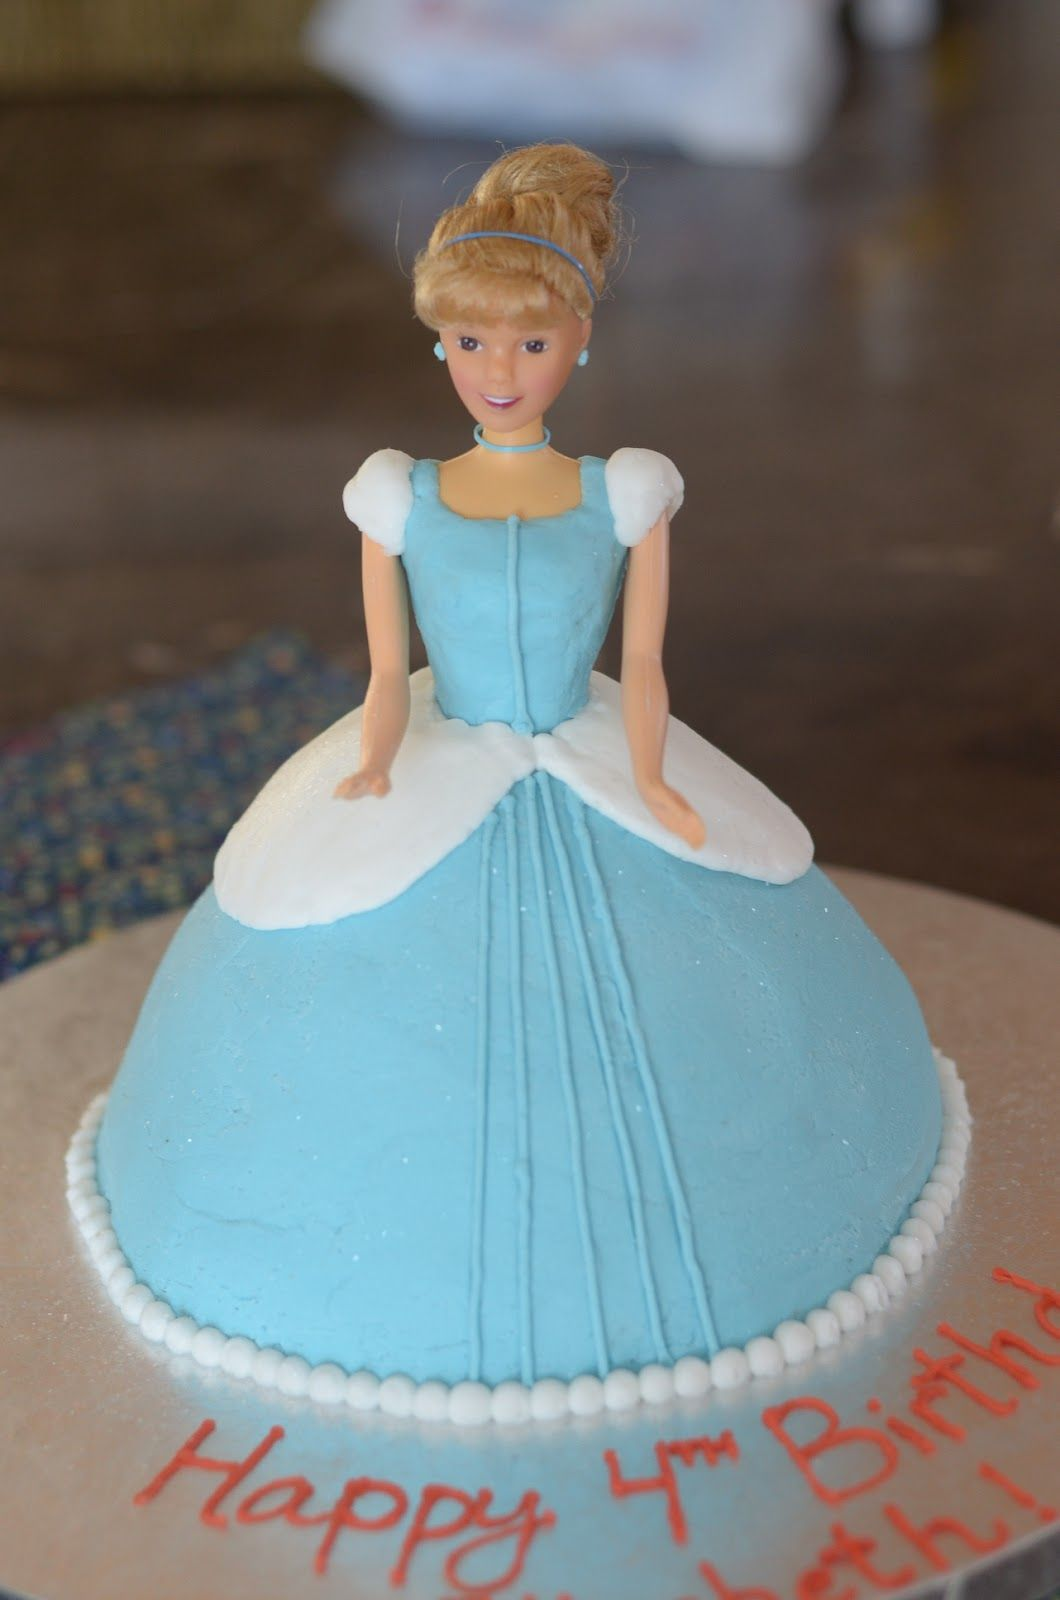 Super Cinderella Cake Decorations With Images Cinderella Birthday Birthday Cards Printable Inklcafe Filternl